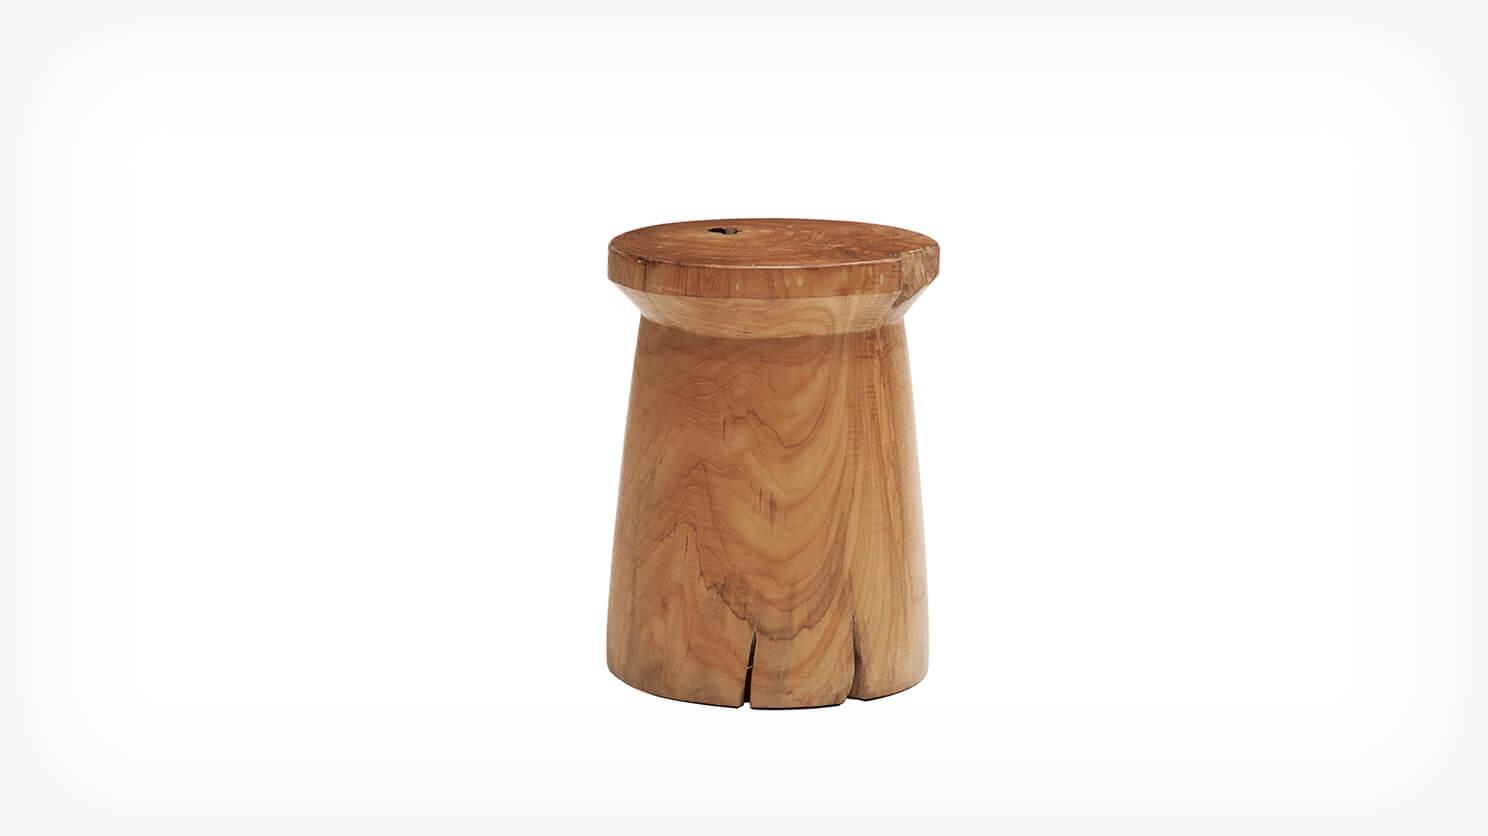 3020 207 15 1 stools solid teak round stool front